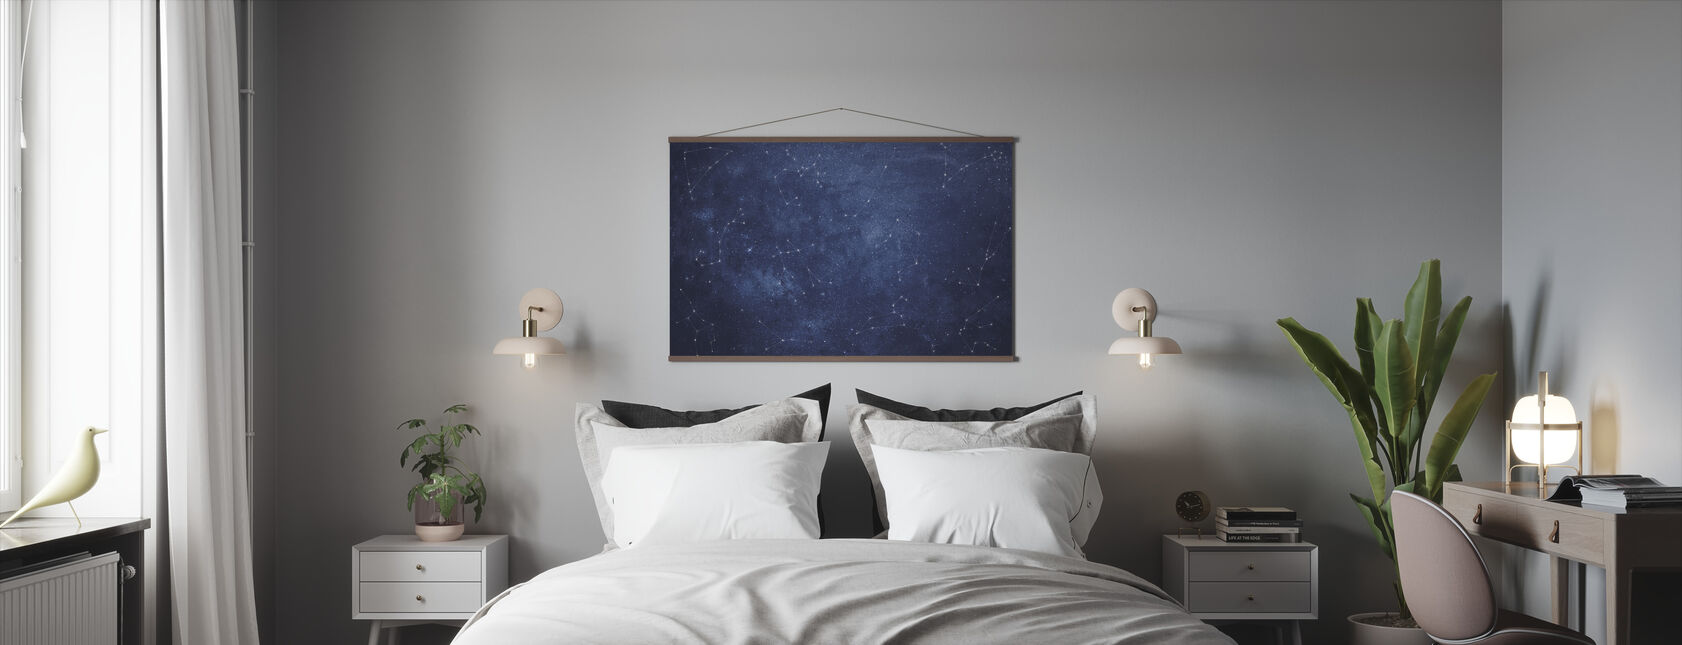 Zoodiac Sky - Poster - Bedroom